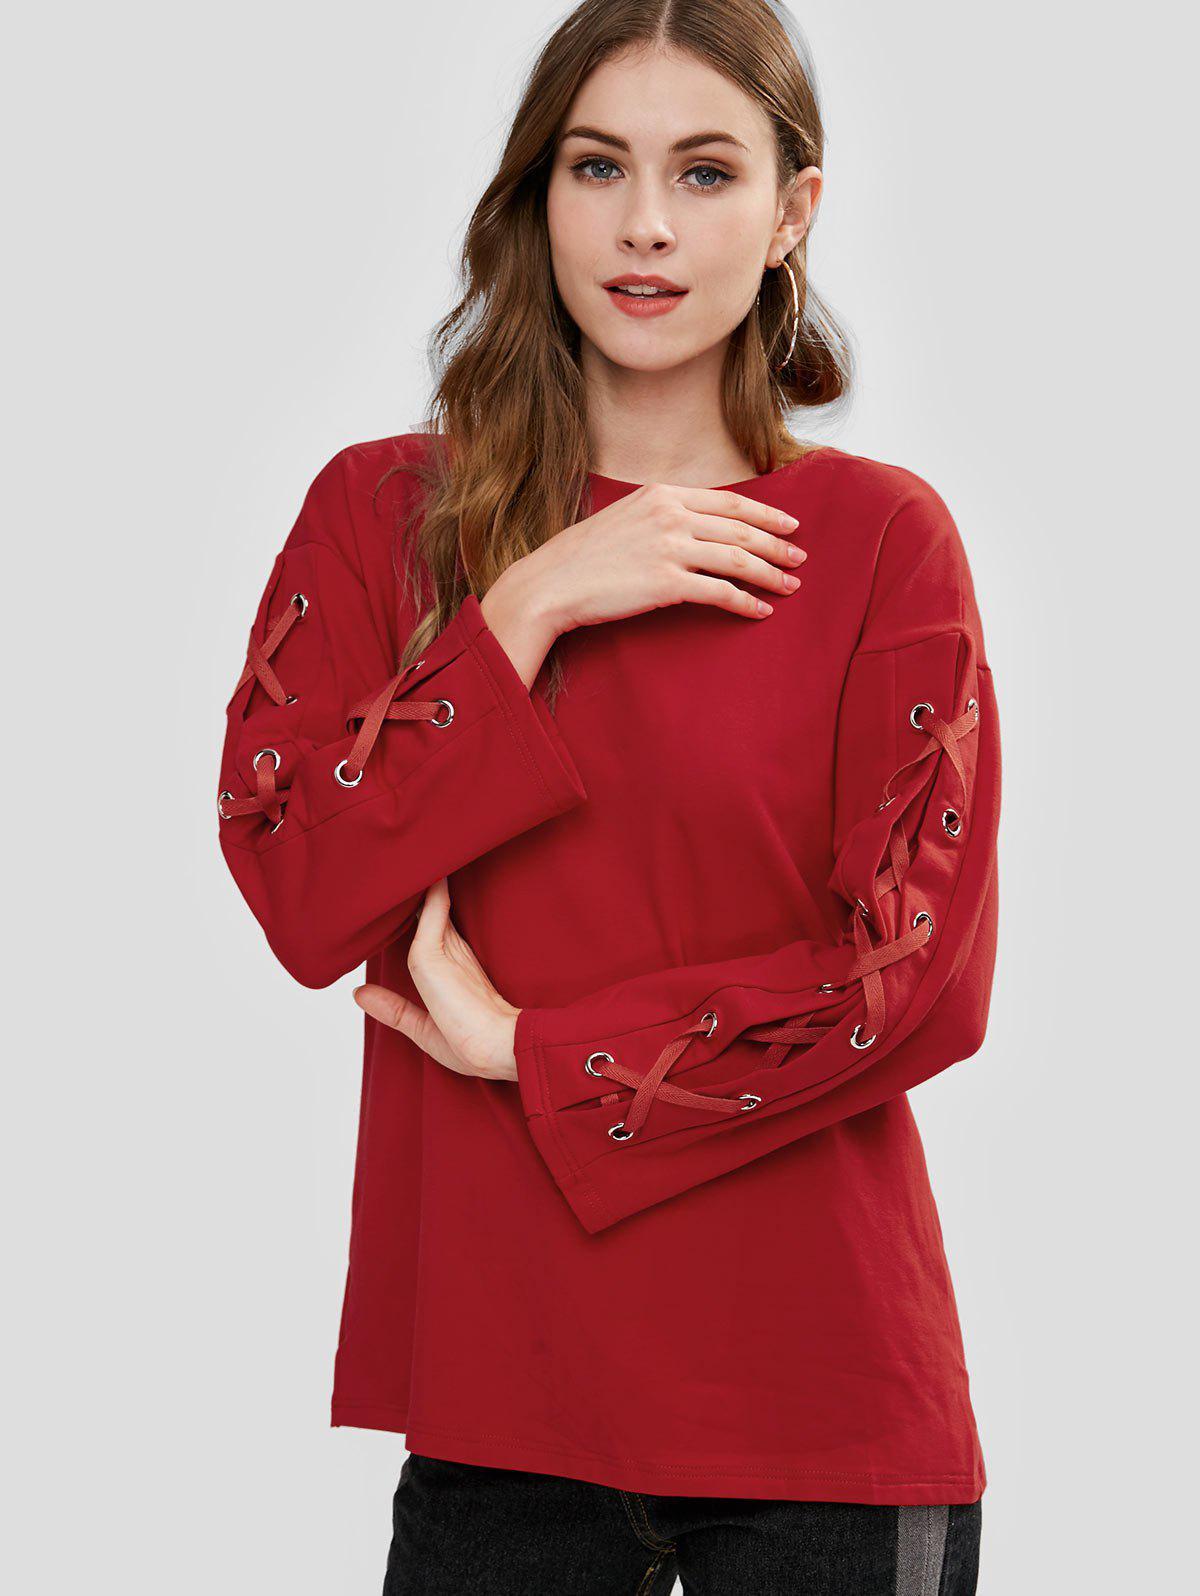 Lace-up Tunic Sweatshirt